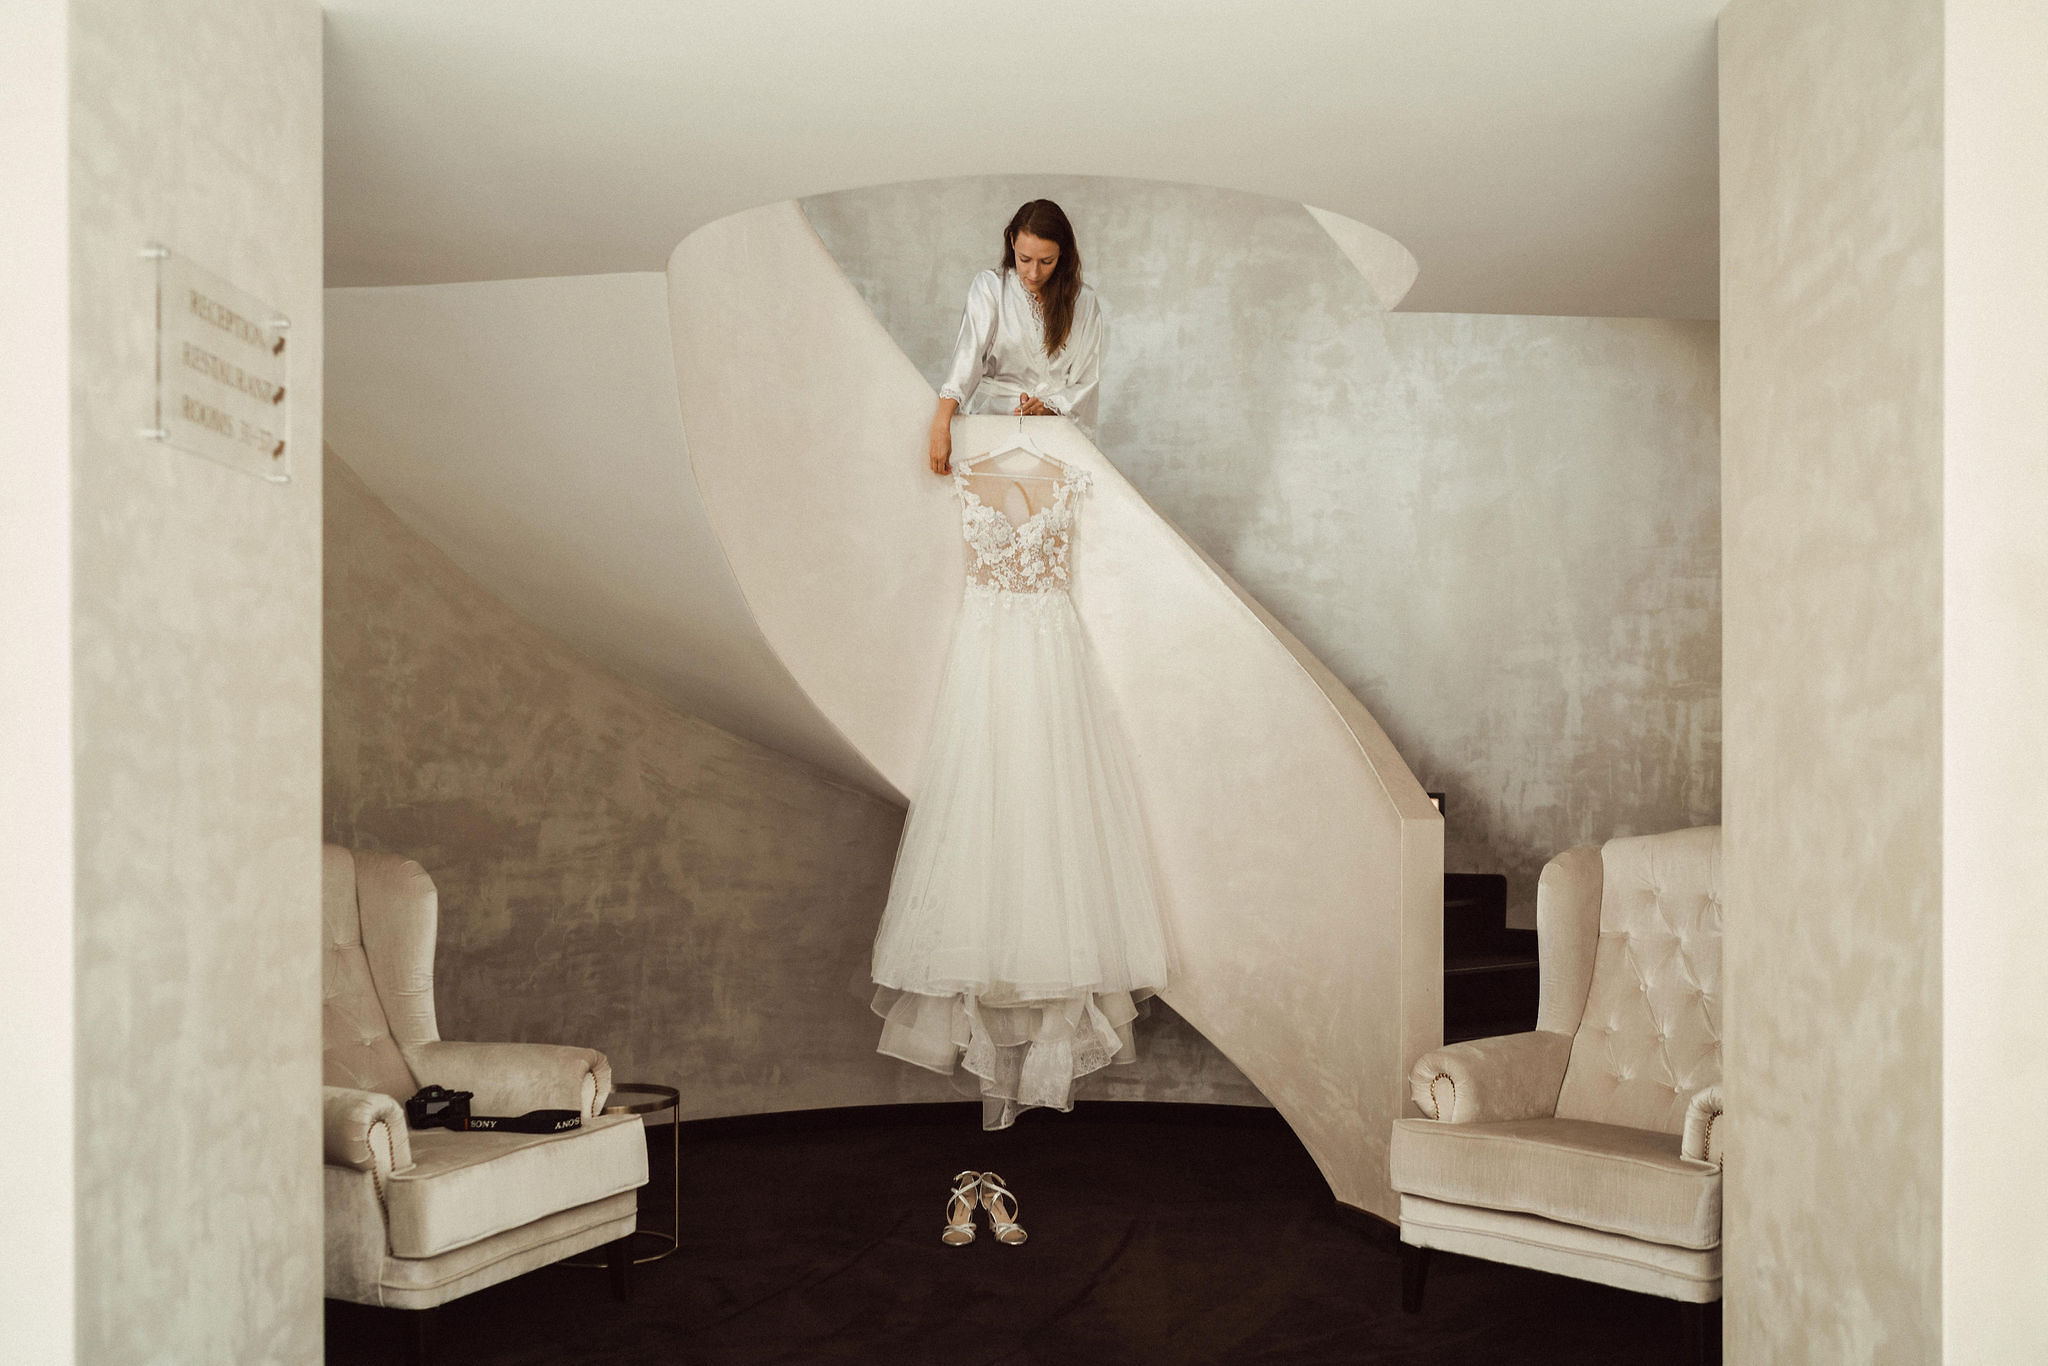 svadba-nitra-zlaty-klucikjpg